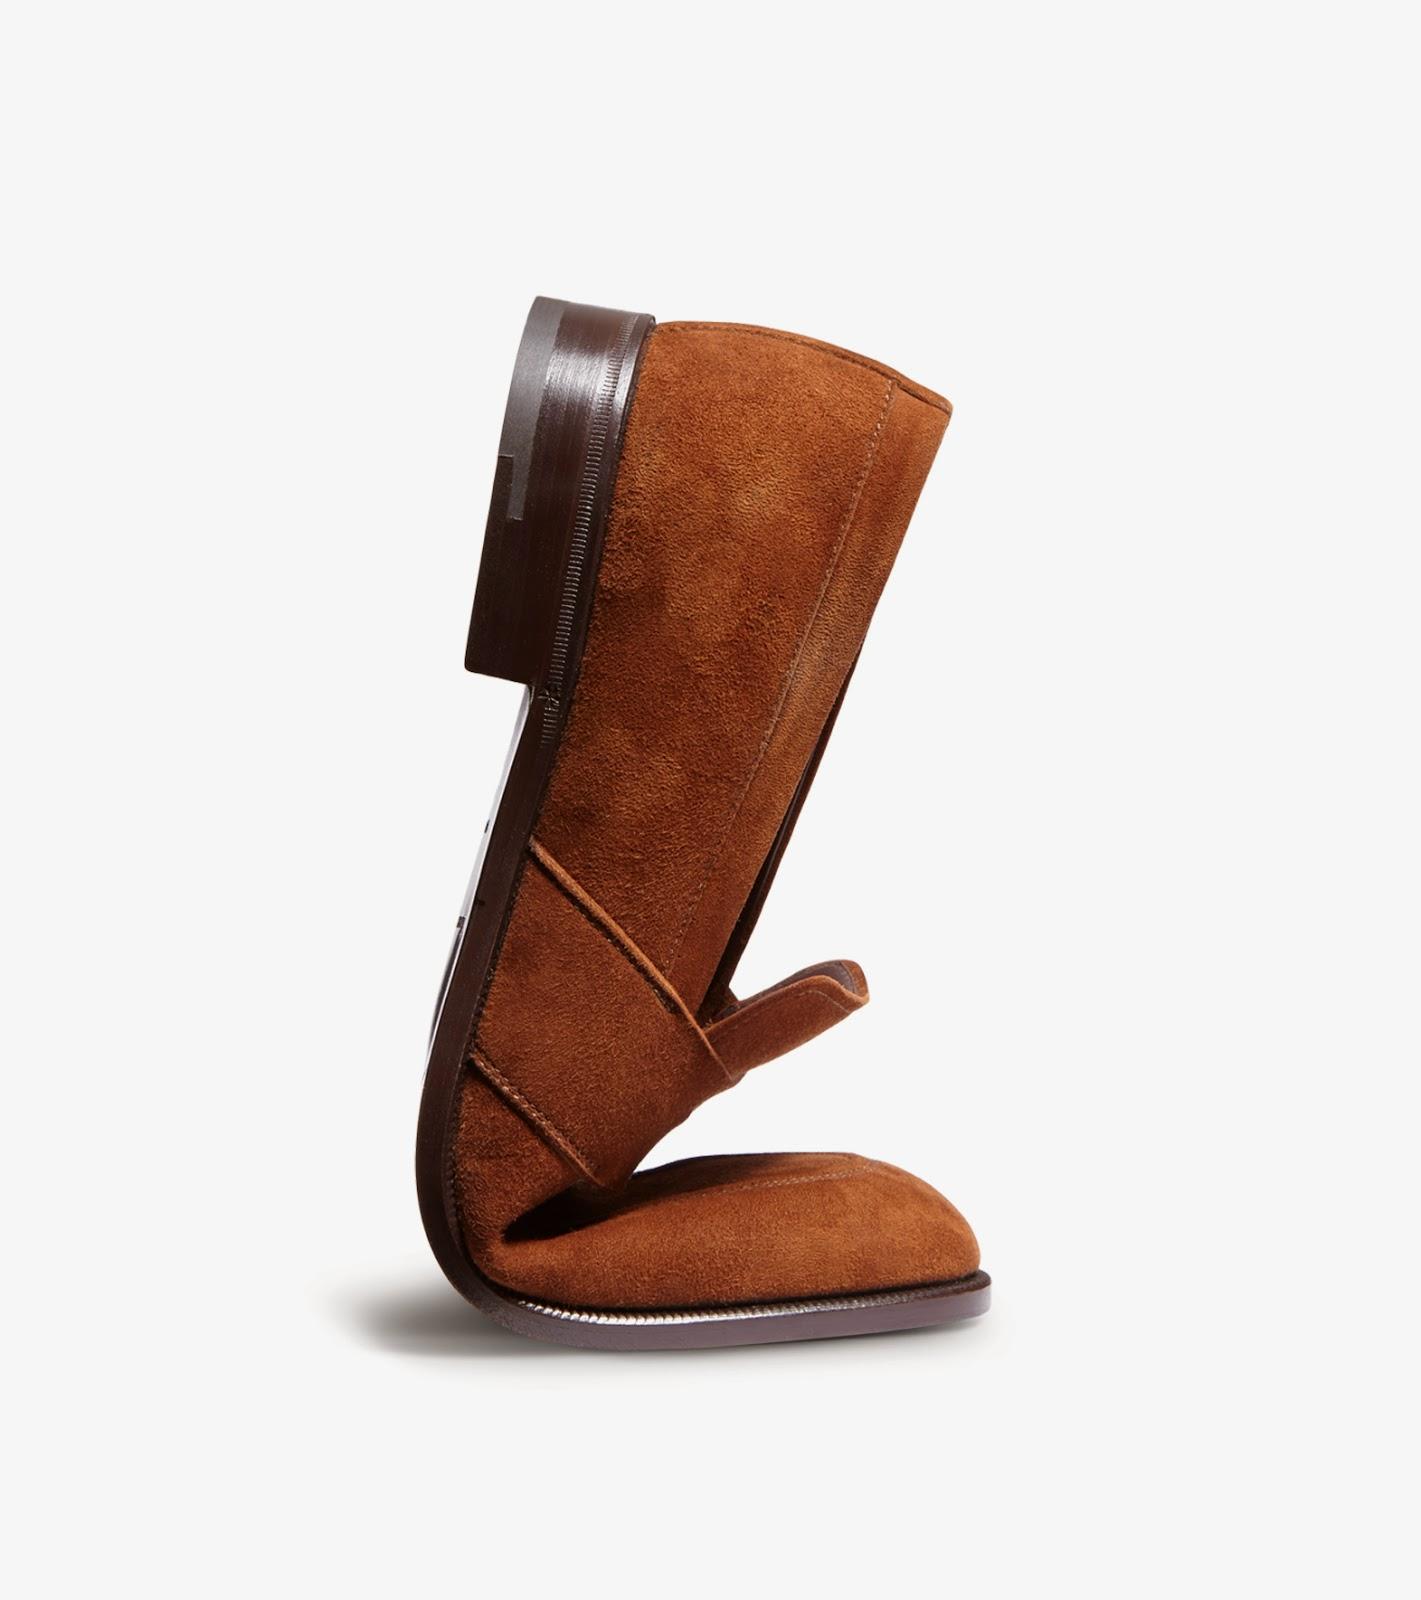 11434efba2f6b Ermenegildo Zegna Flex Shoes - Comfort For Style Should Not Be Compromised